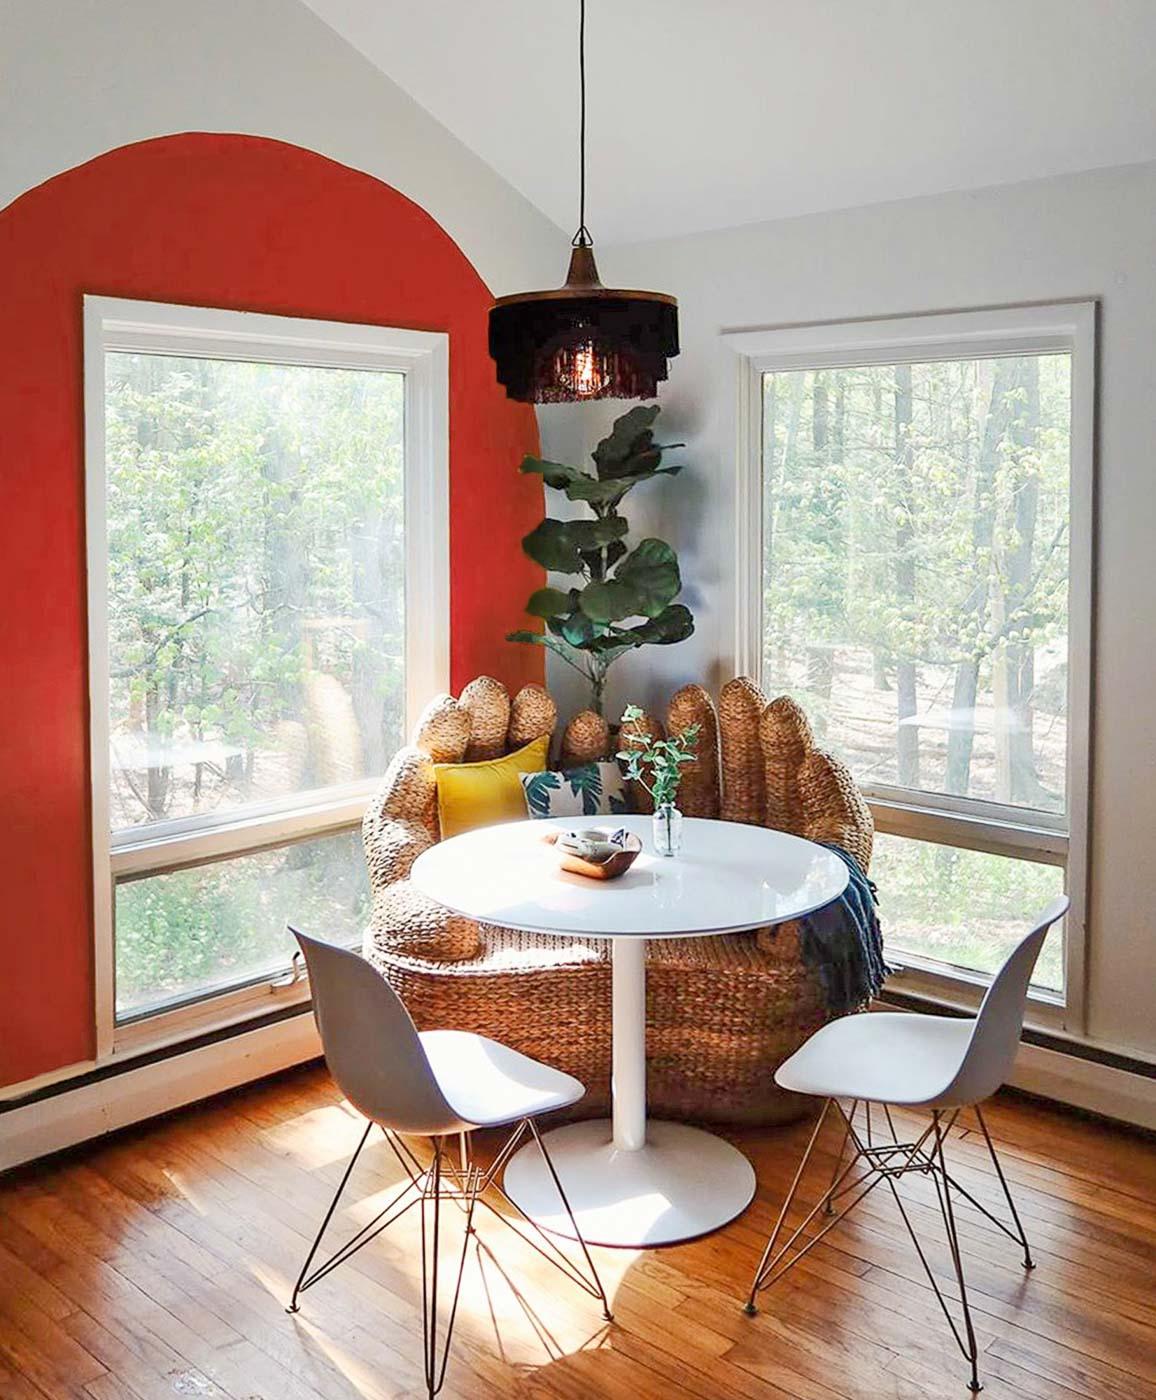 Нарисованная арка, обрамляющая окно кухни